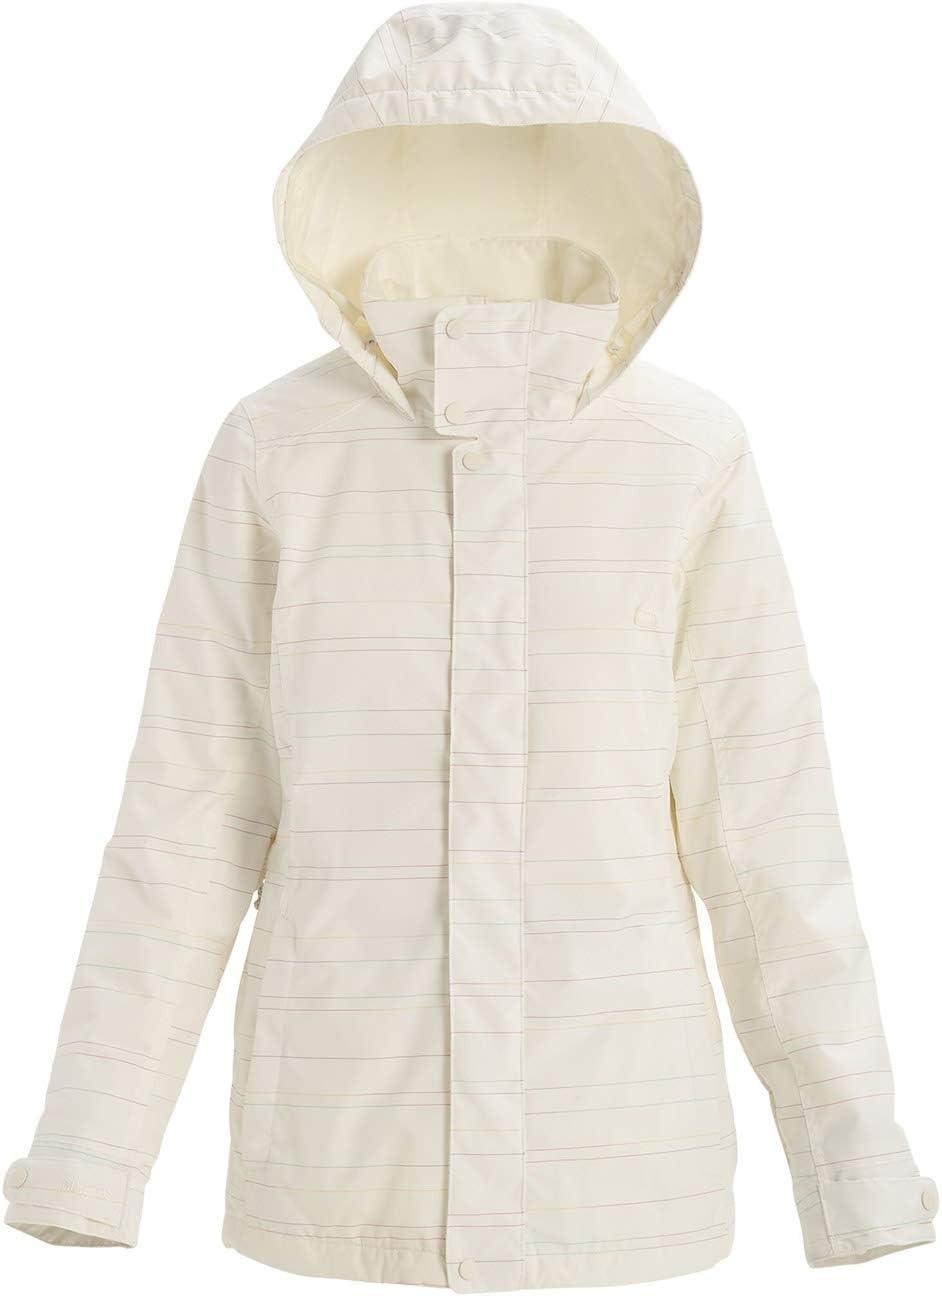 Stout Weiß spacedye M Burton Damen Snowboard Jacke Jet Set Jacket